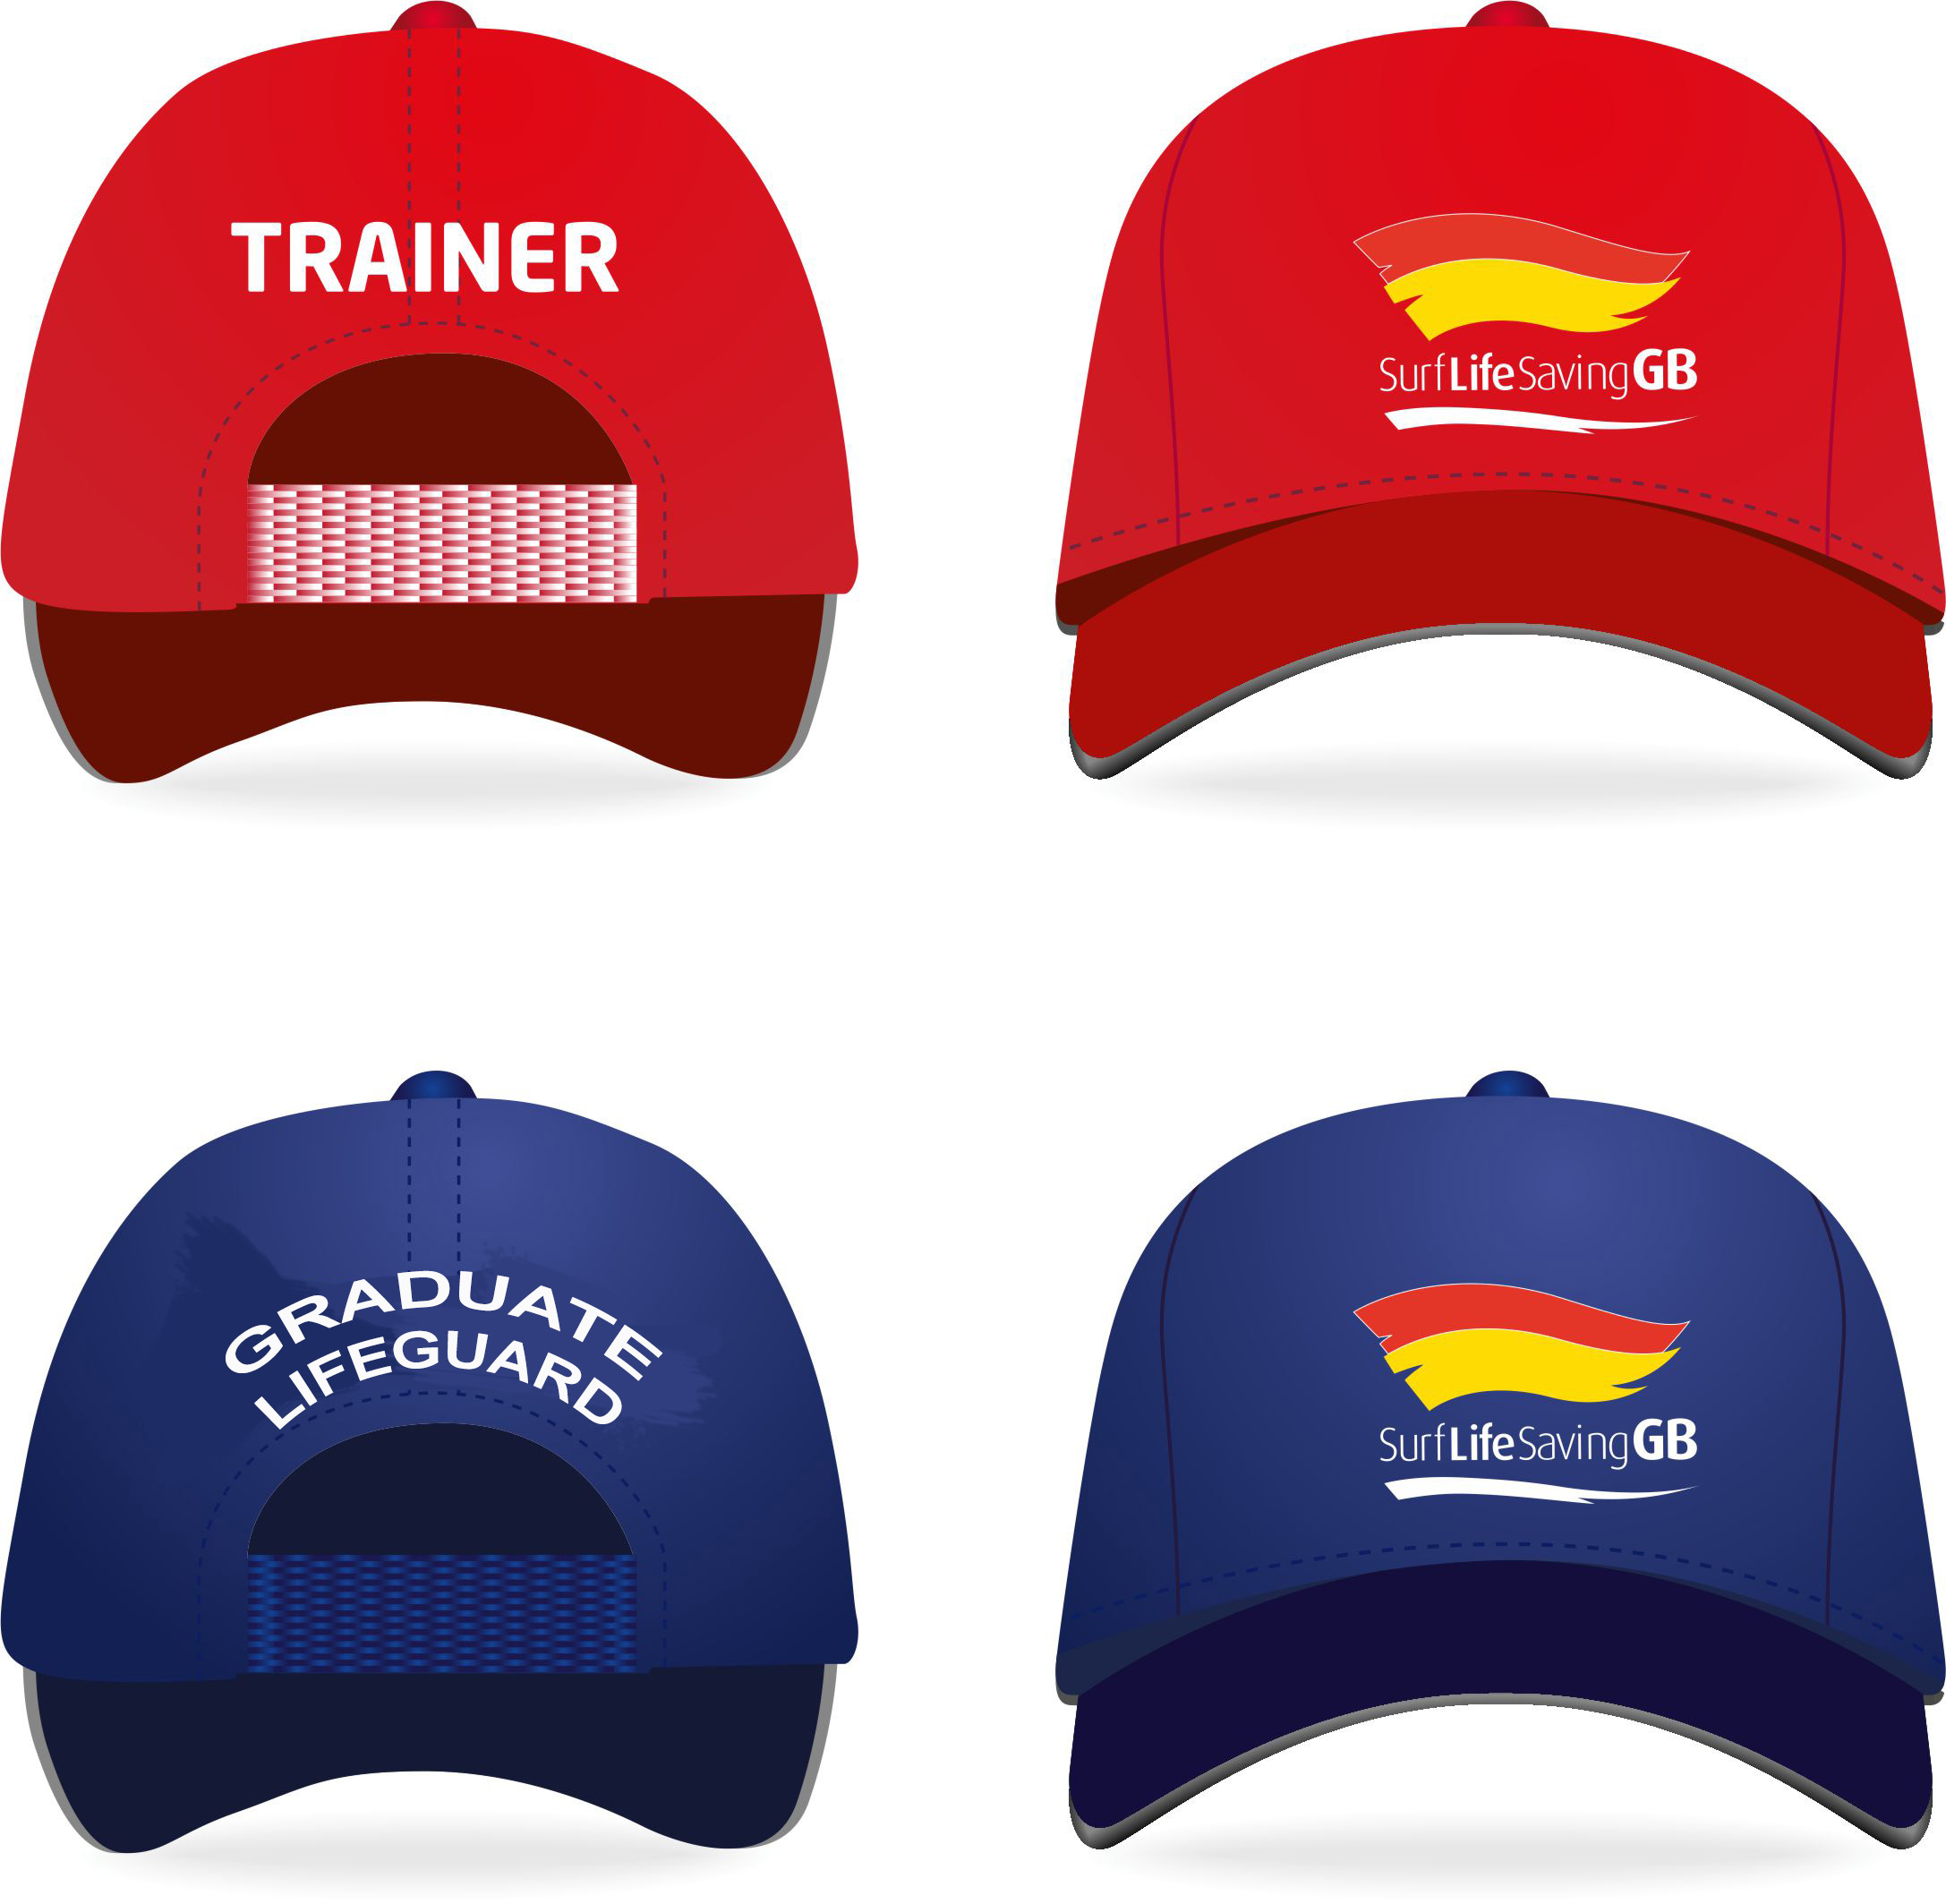 SLSGB Graduate Lifeguard Programme Cap